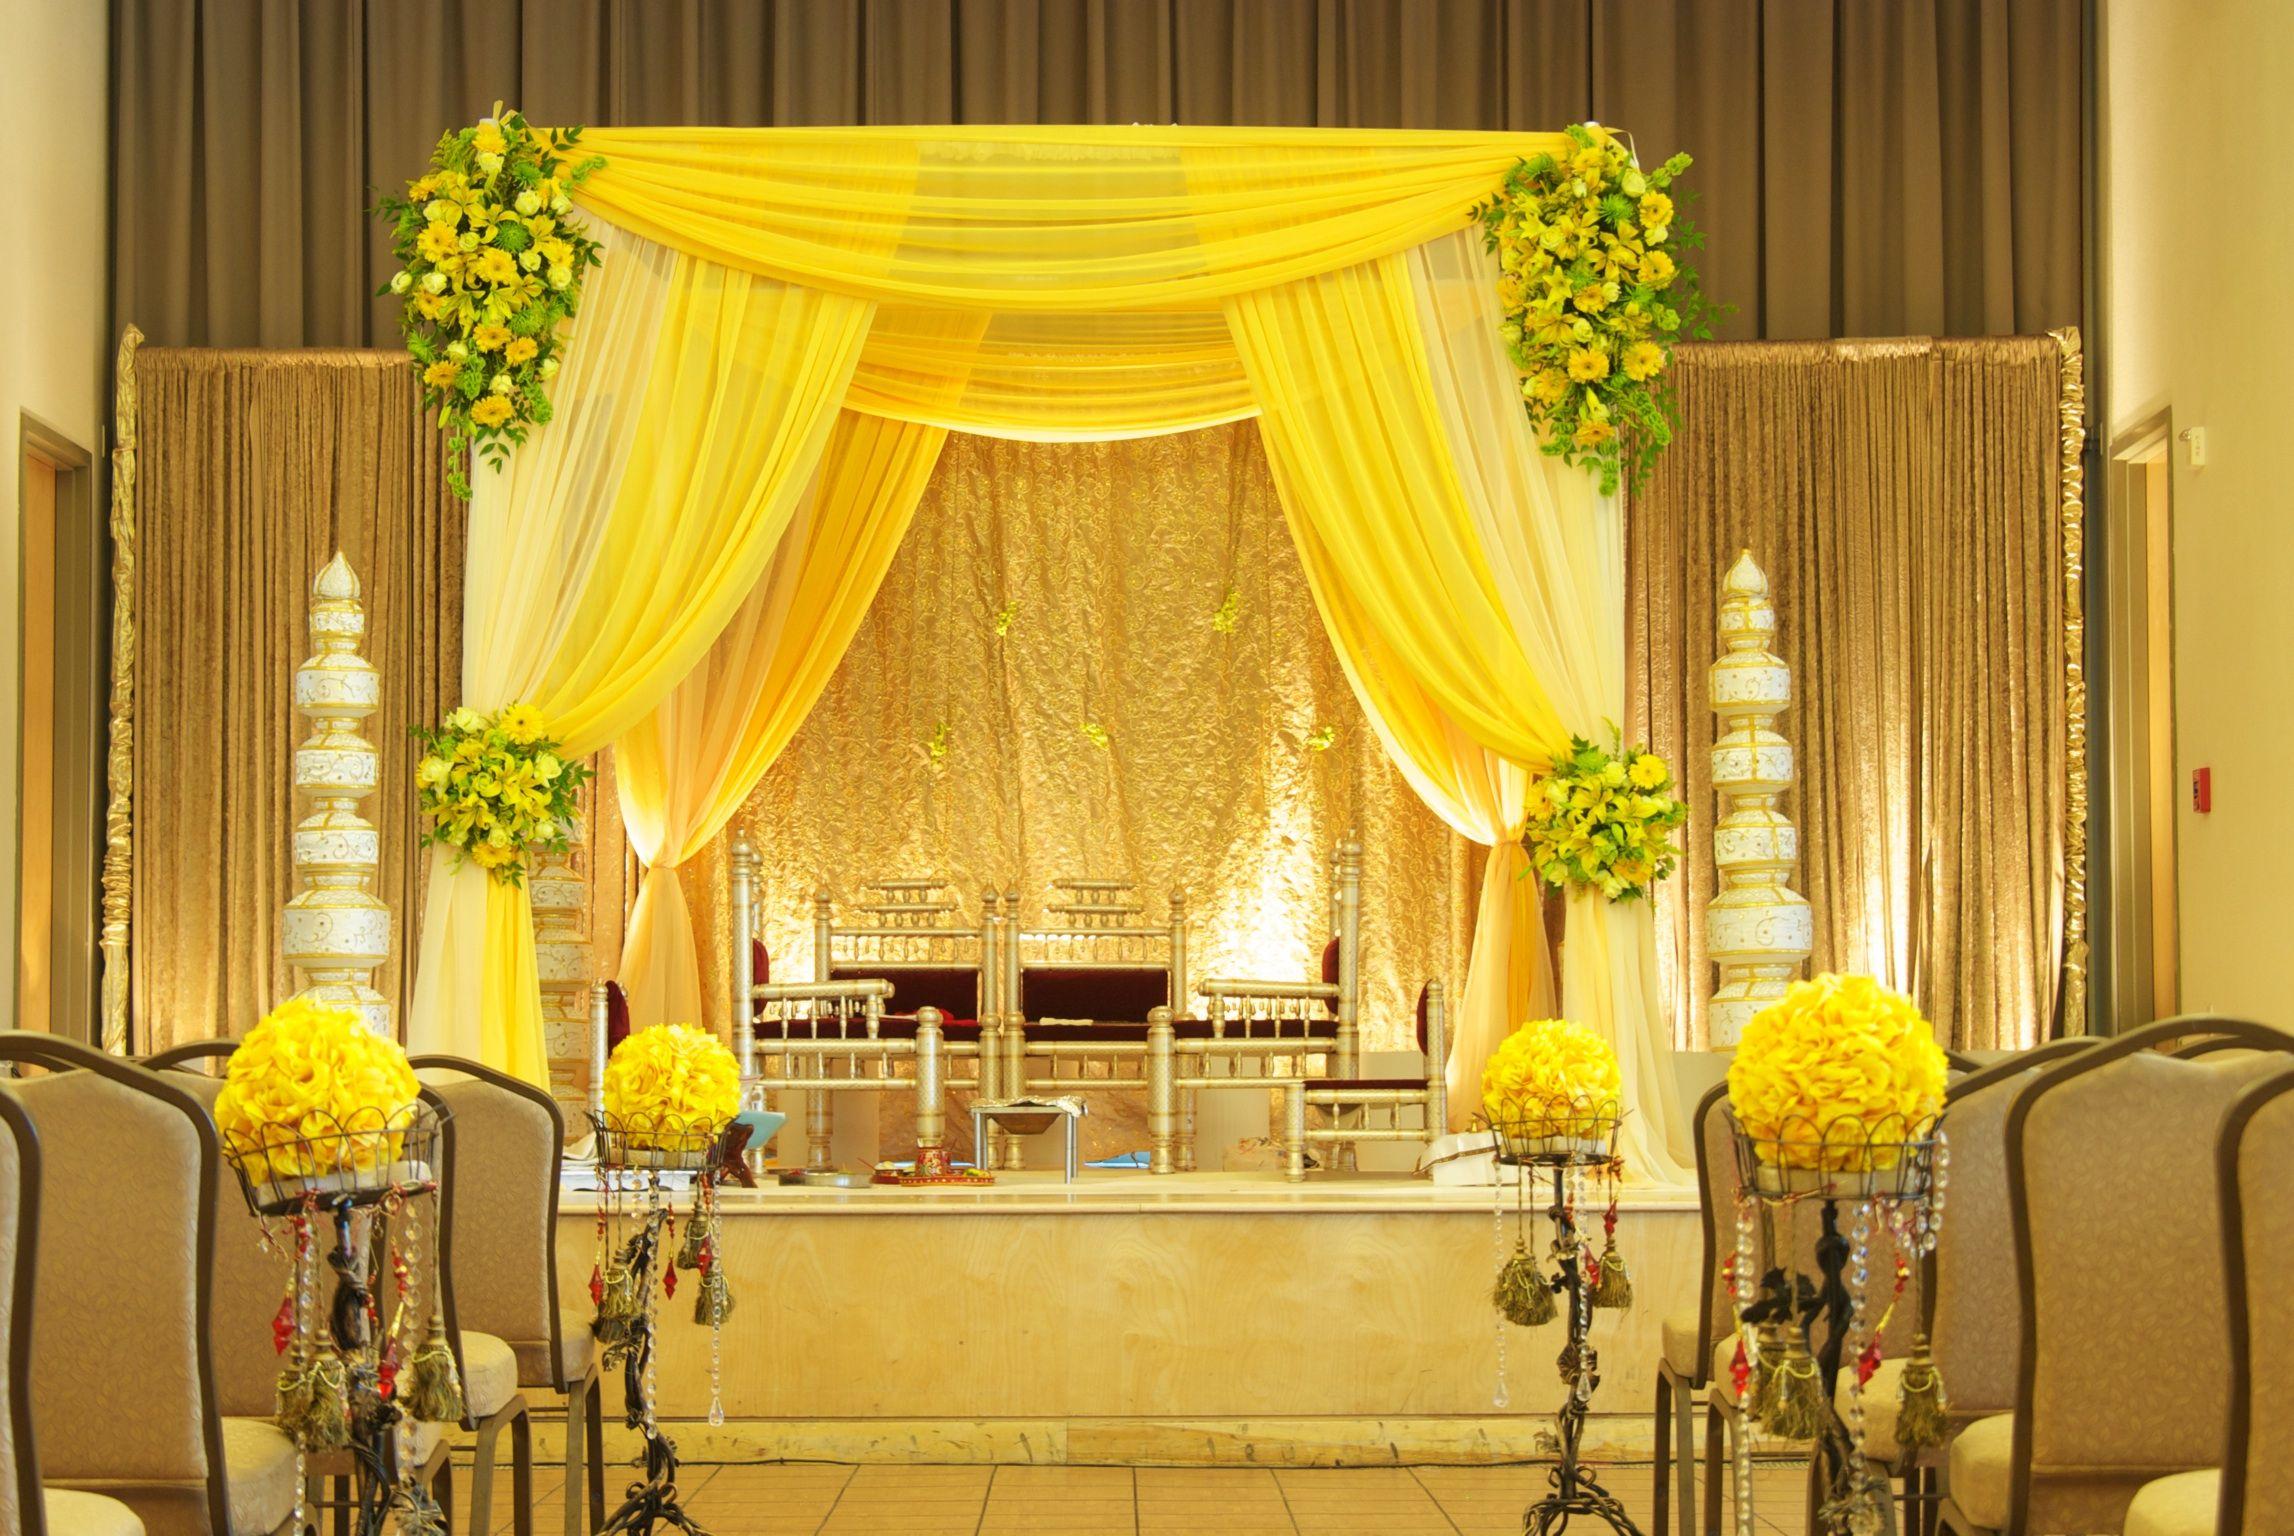 yellow fabric style Mandap | Wedding mandap, Wedding decor ...